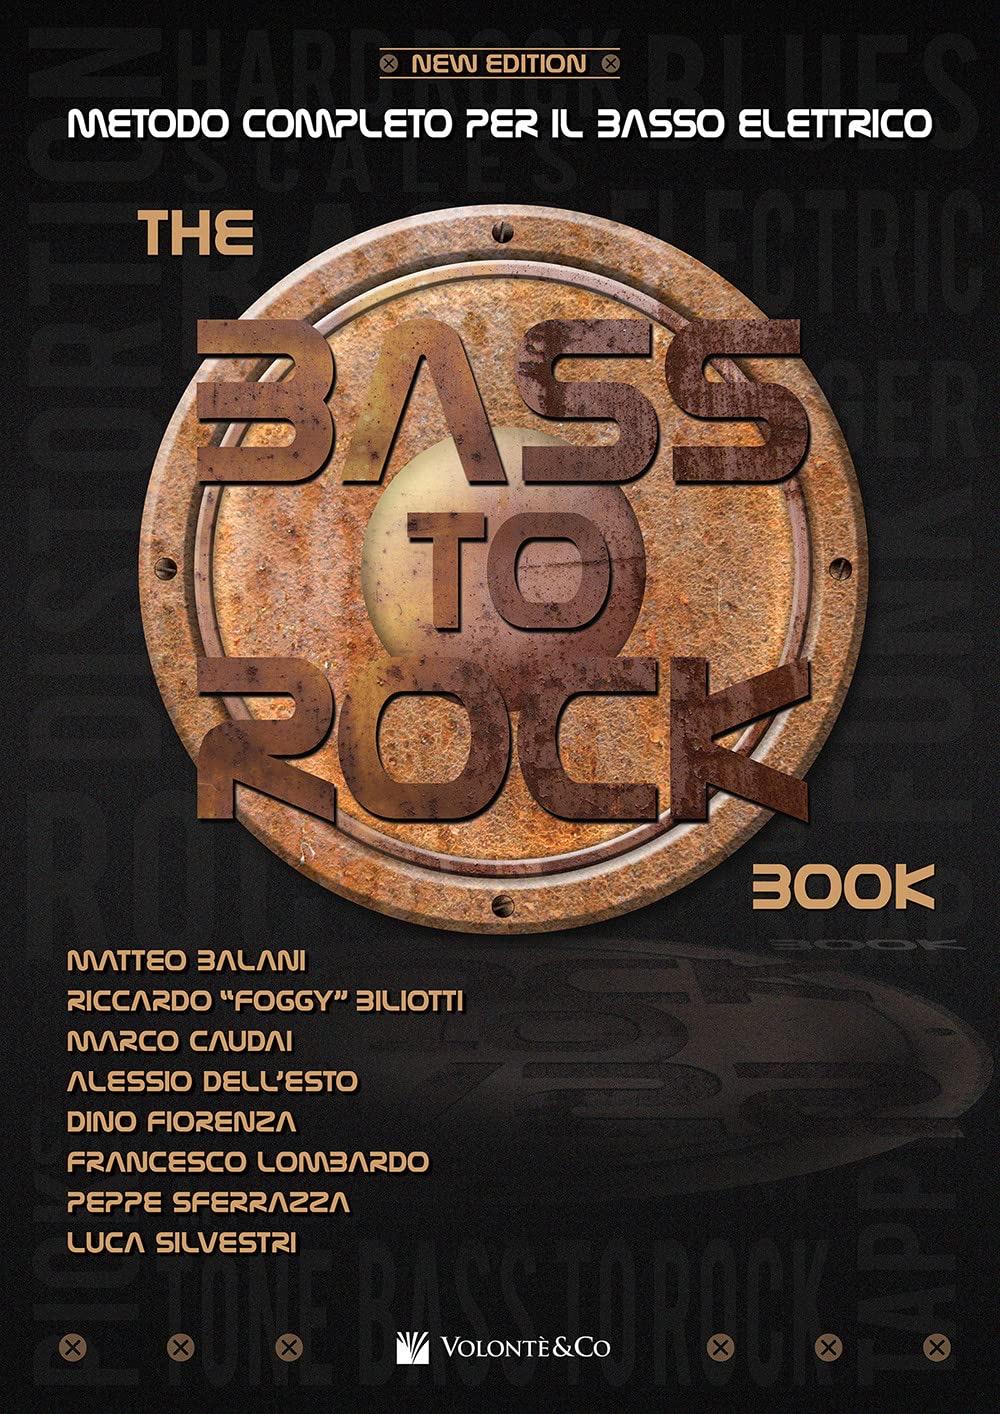 """The Bass To Rock Book"": approccio versatile al rock"